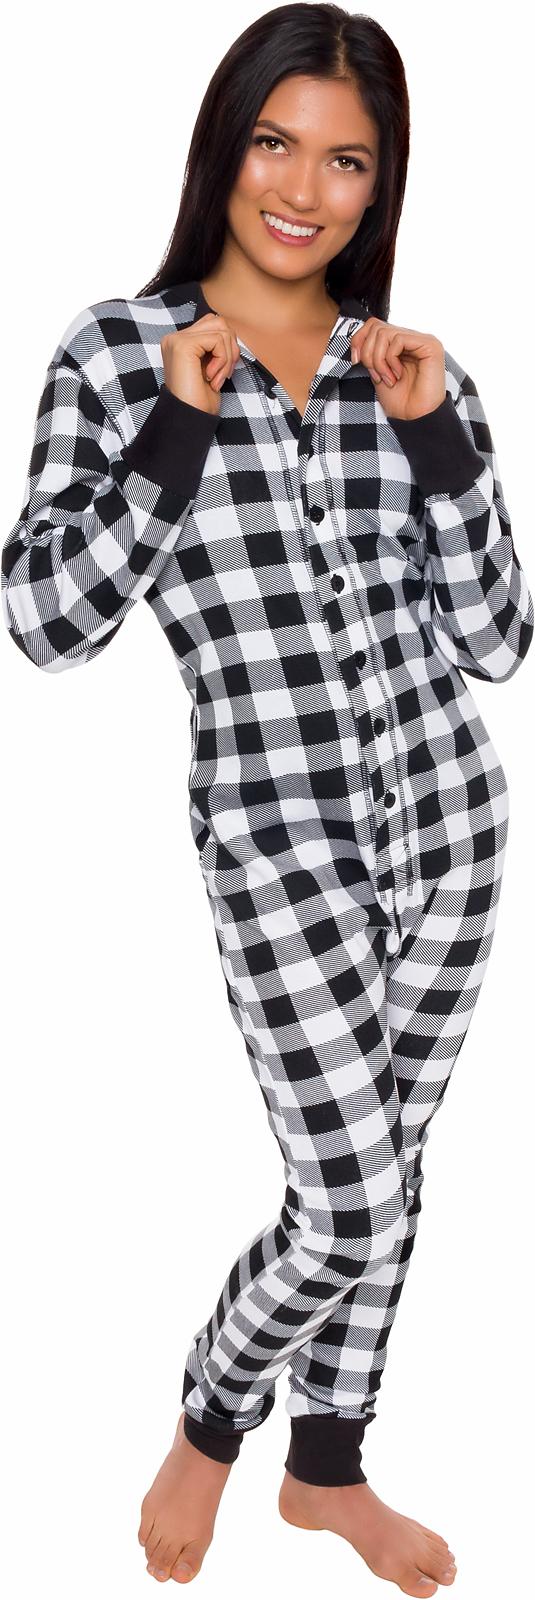 b0c55c9c8ec8 Details about Silver Lilly Unisex Adult Plaid One Piece Pajamas w  Drop  Seat (Black White